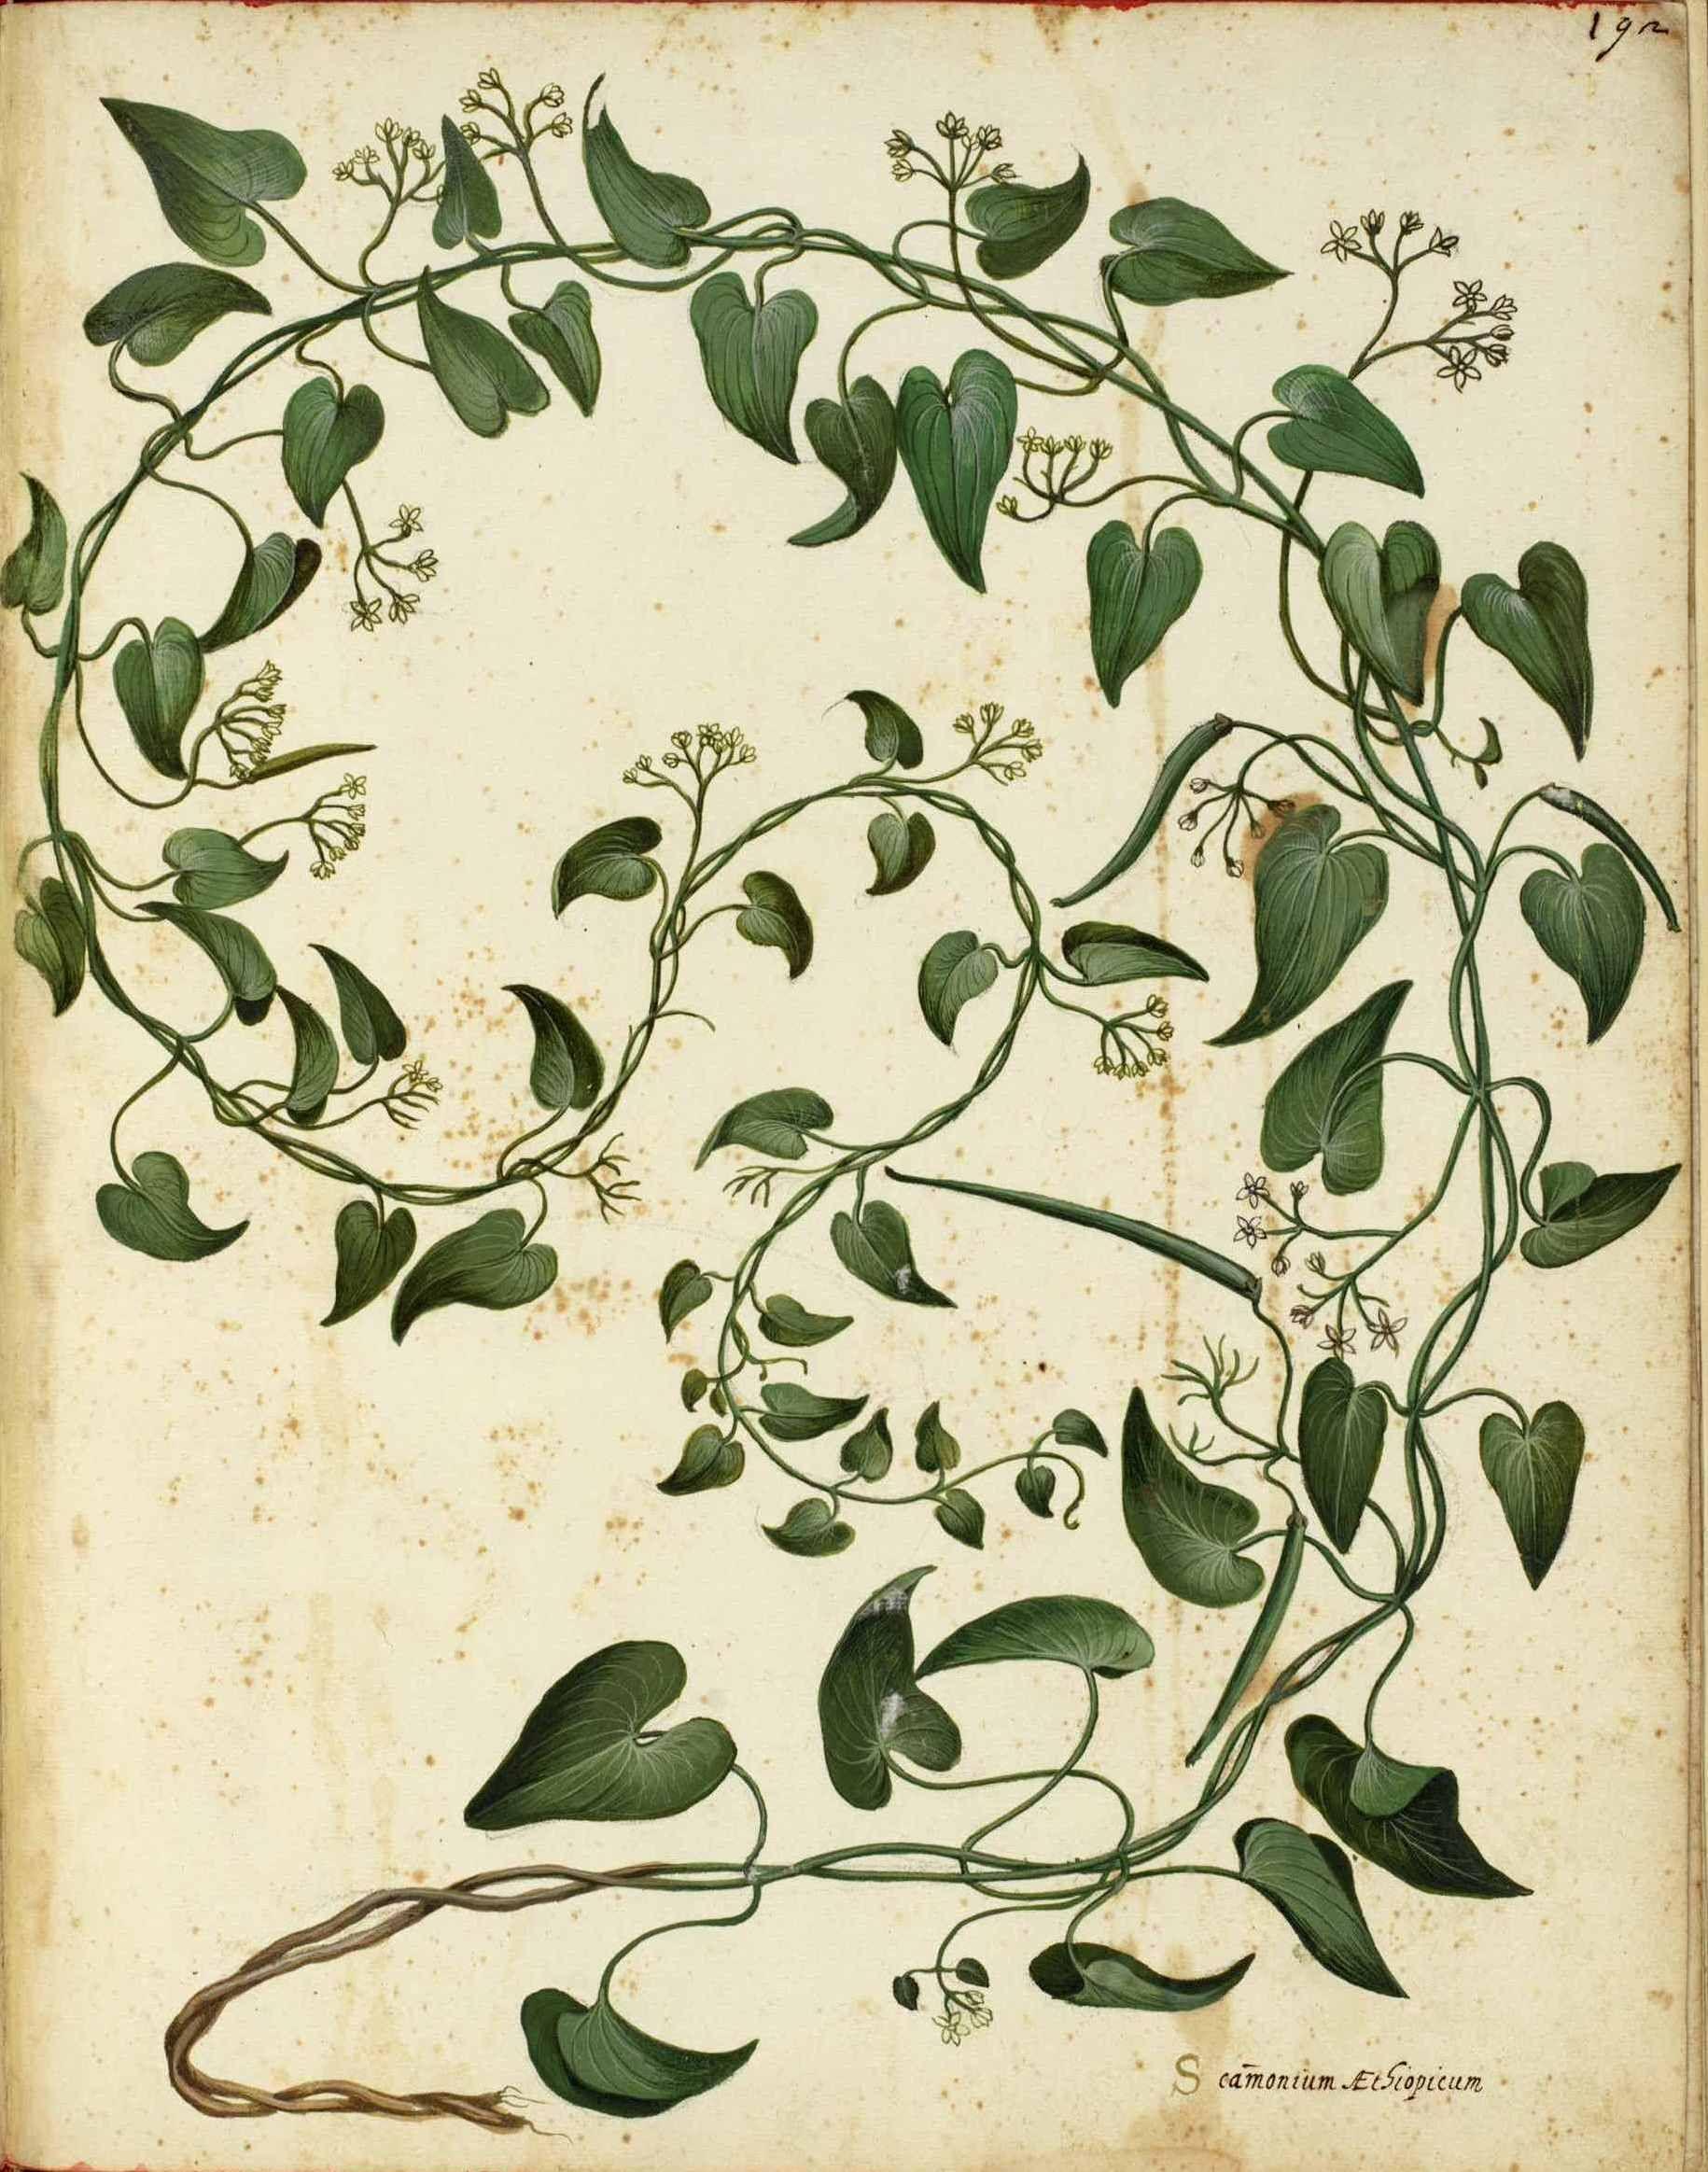 775 Vintage Botanical Flowers | Printables + Public Domain ...  775 Vintage Bot...